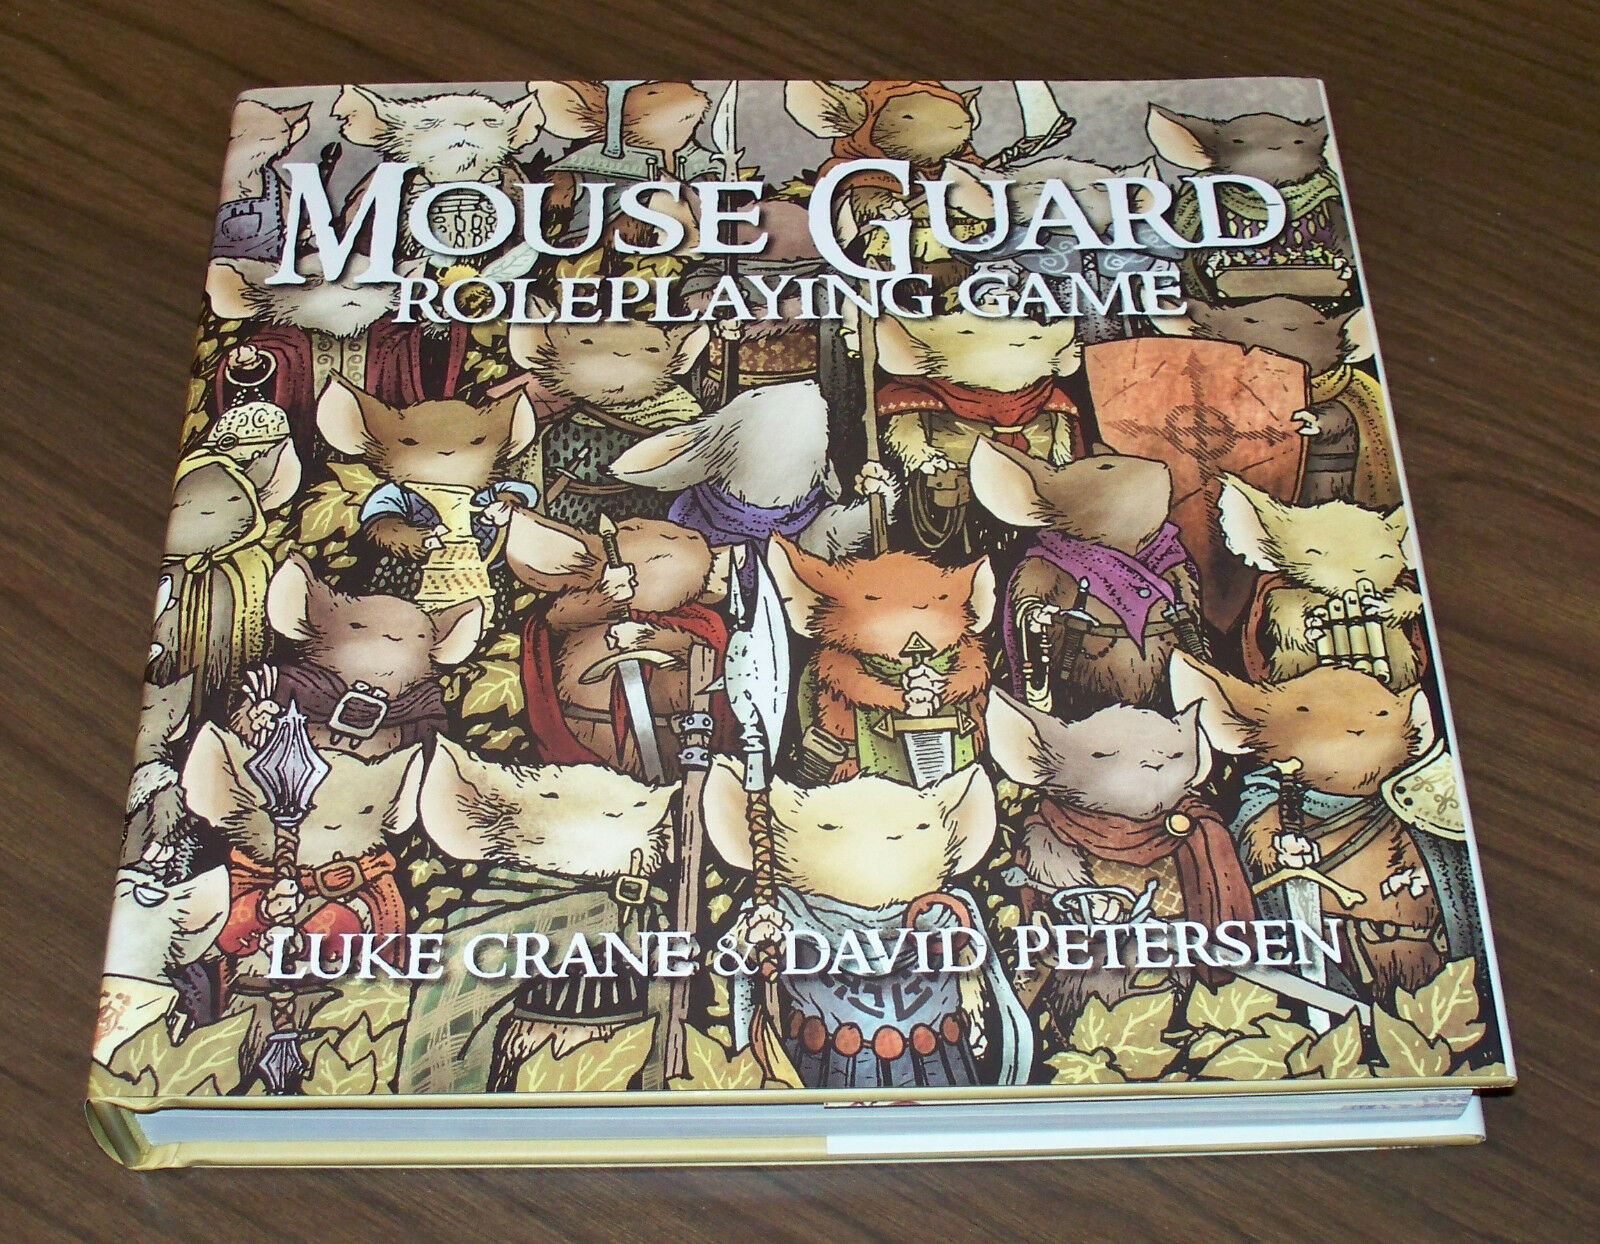 rivenditori online MOUSE GUARD ROLEPLAYING gioco HC Luke Crane Crane Crane David Petersen Burning Rueda RPG GDR  acquista la qualità autentica al 100%